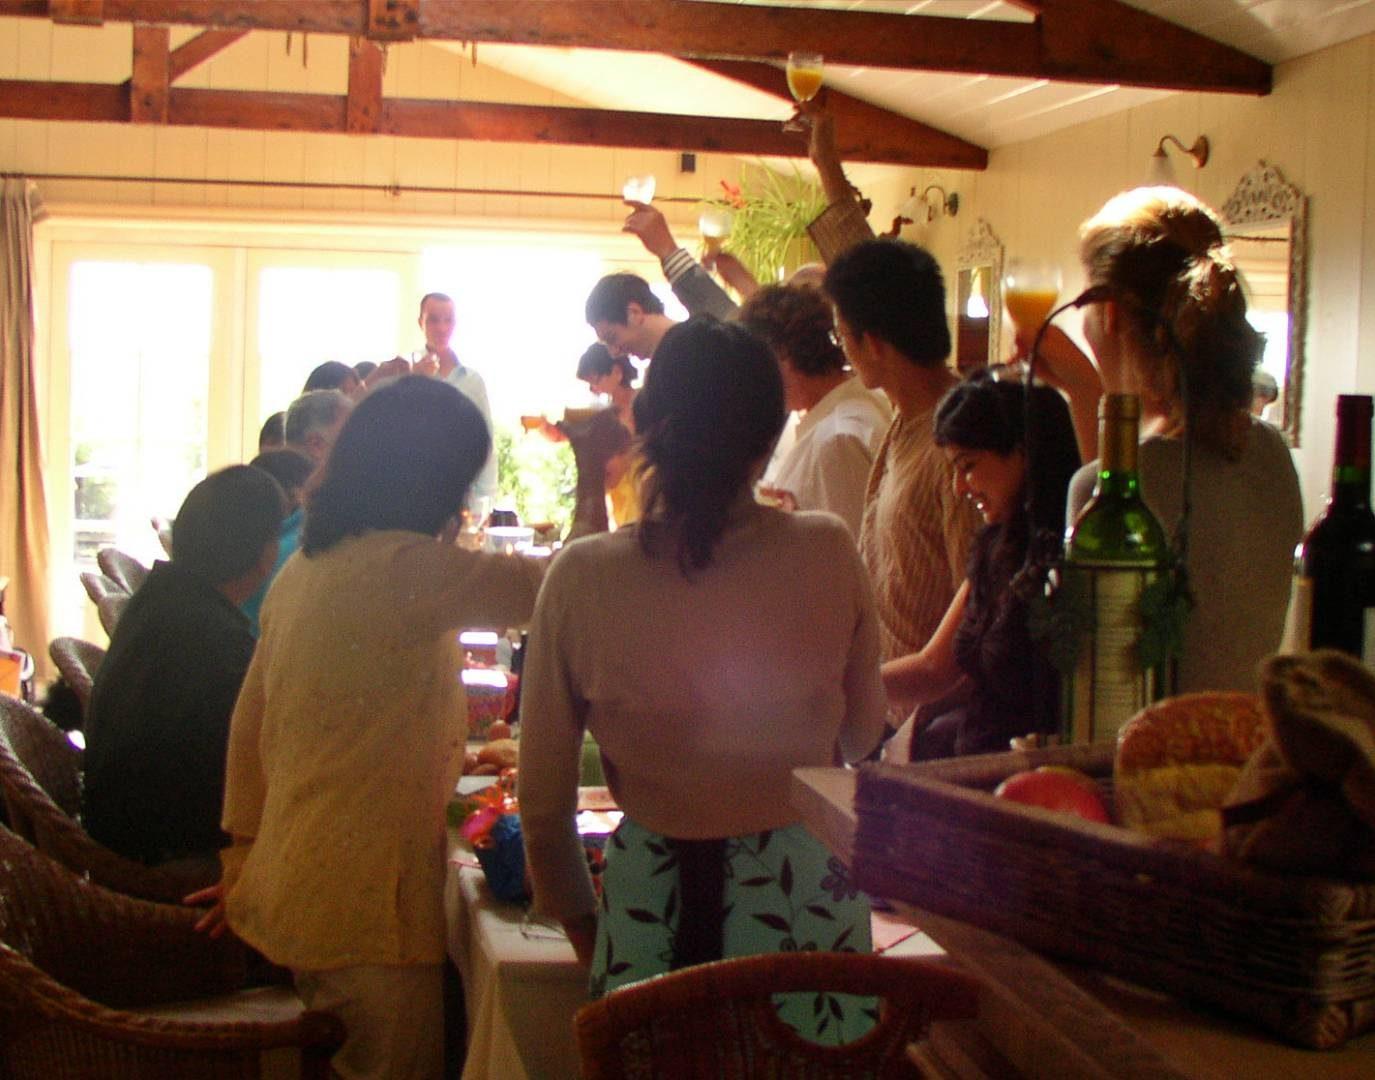 vriendinnenweekend diner verjaardagsfeest reunie overnachting-01